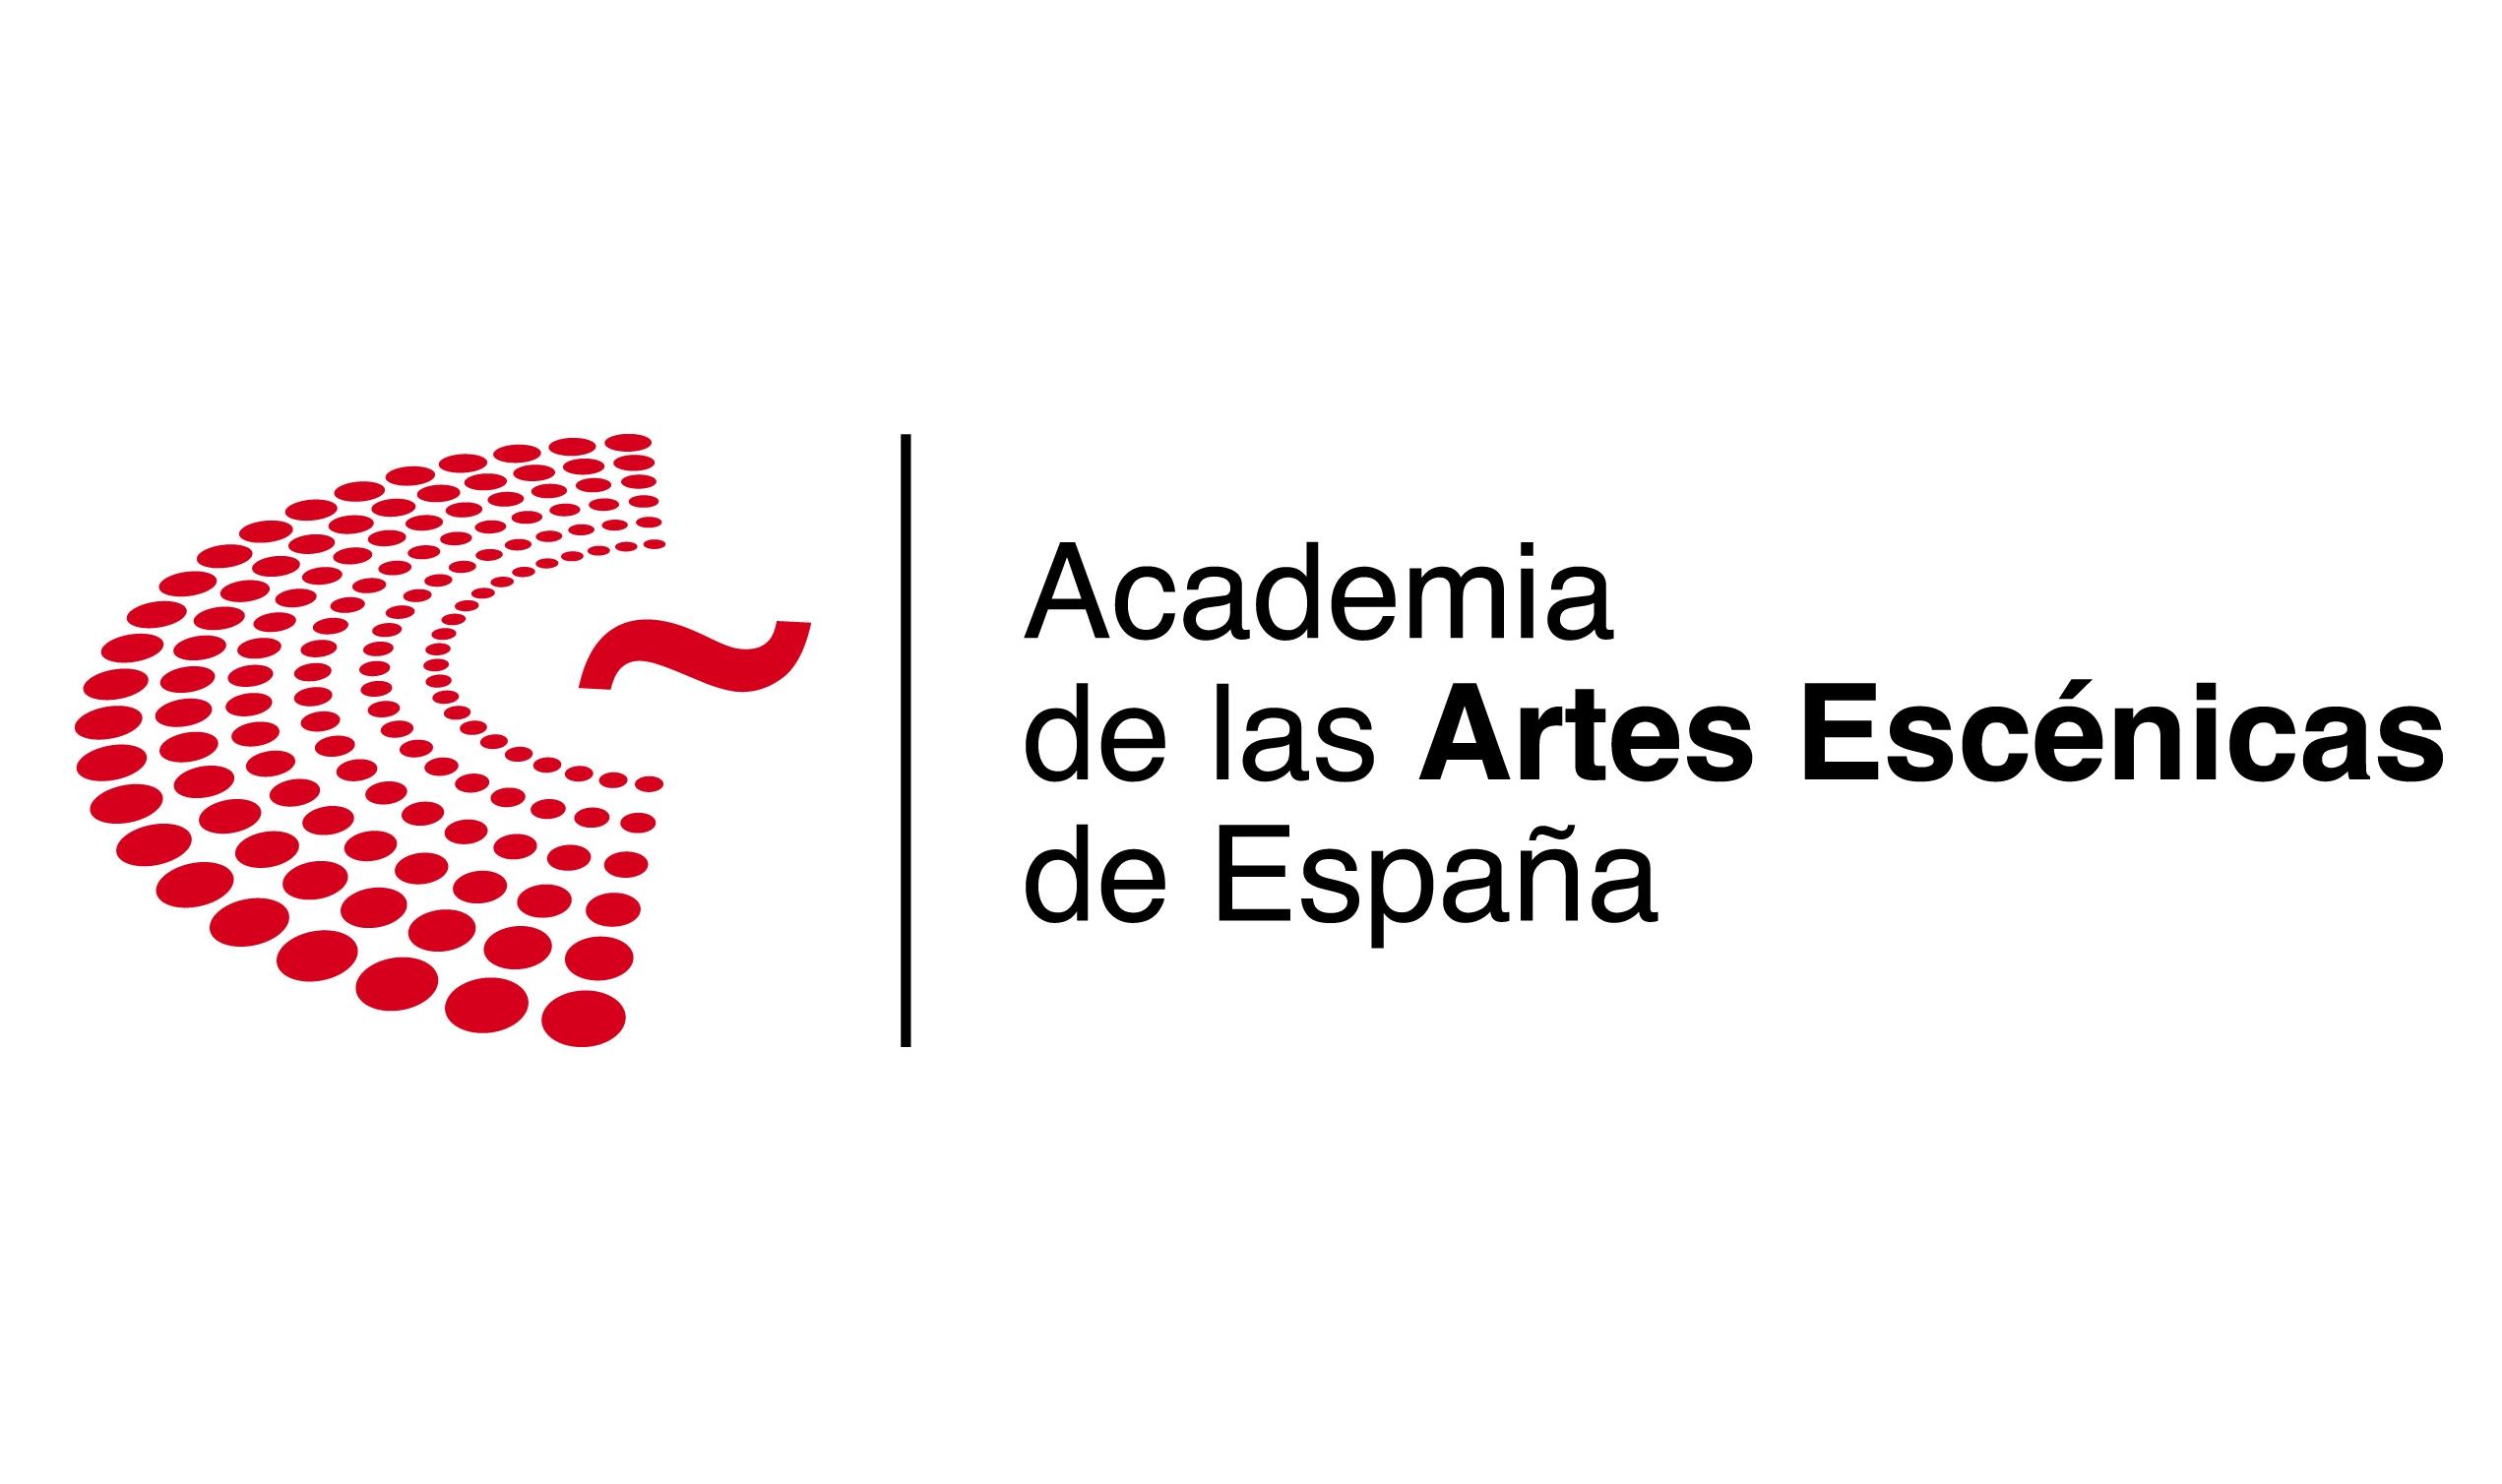 Académia Artes Escénicas